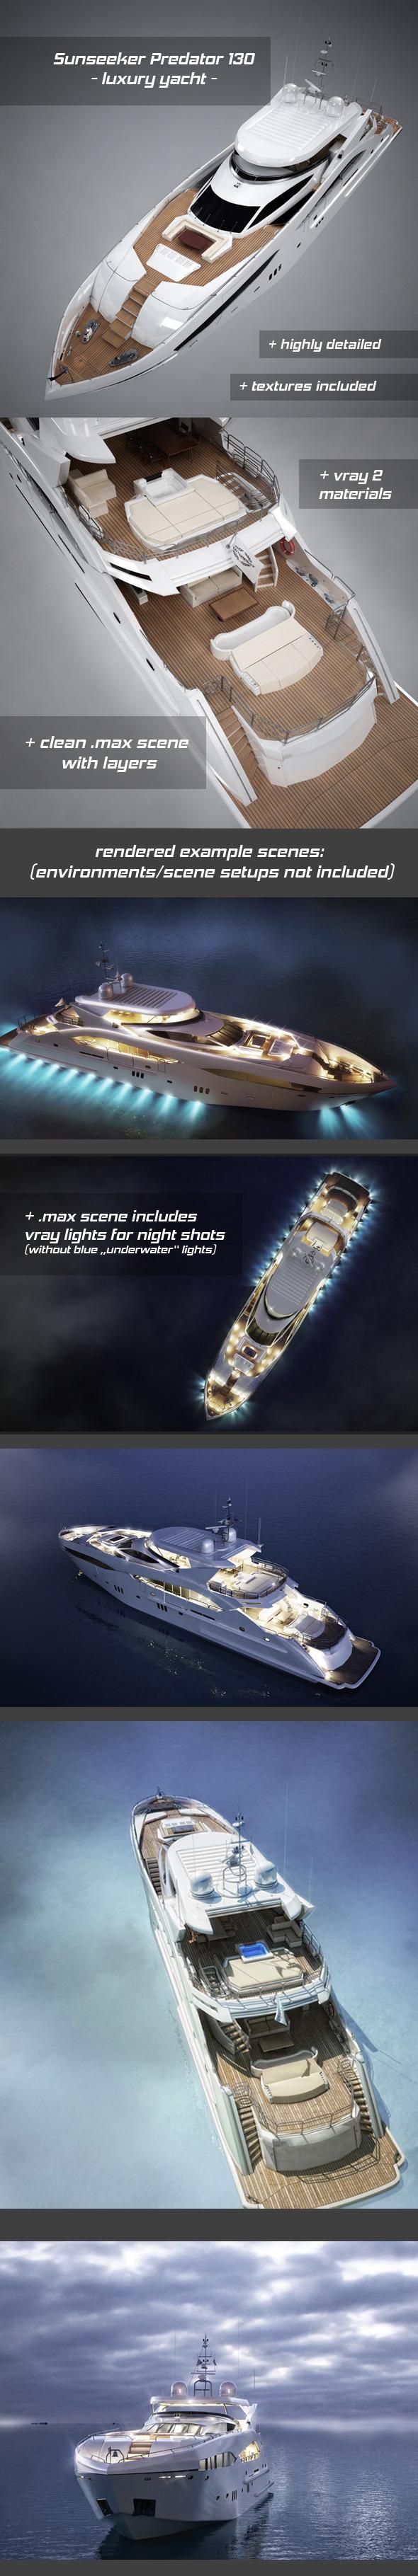 3DOcean Sunseeker Predator 130 luxury yacht 8533534